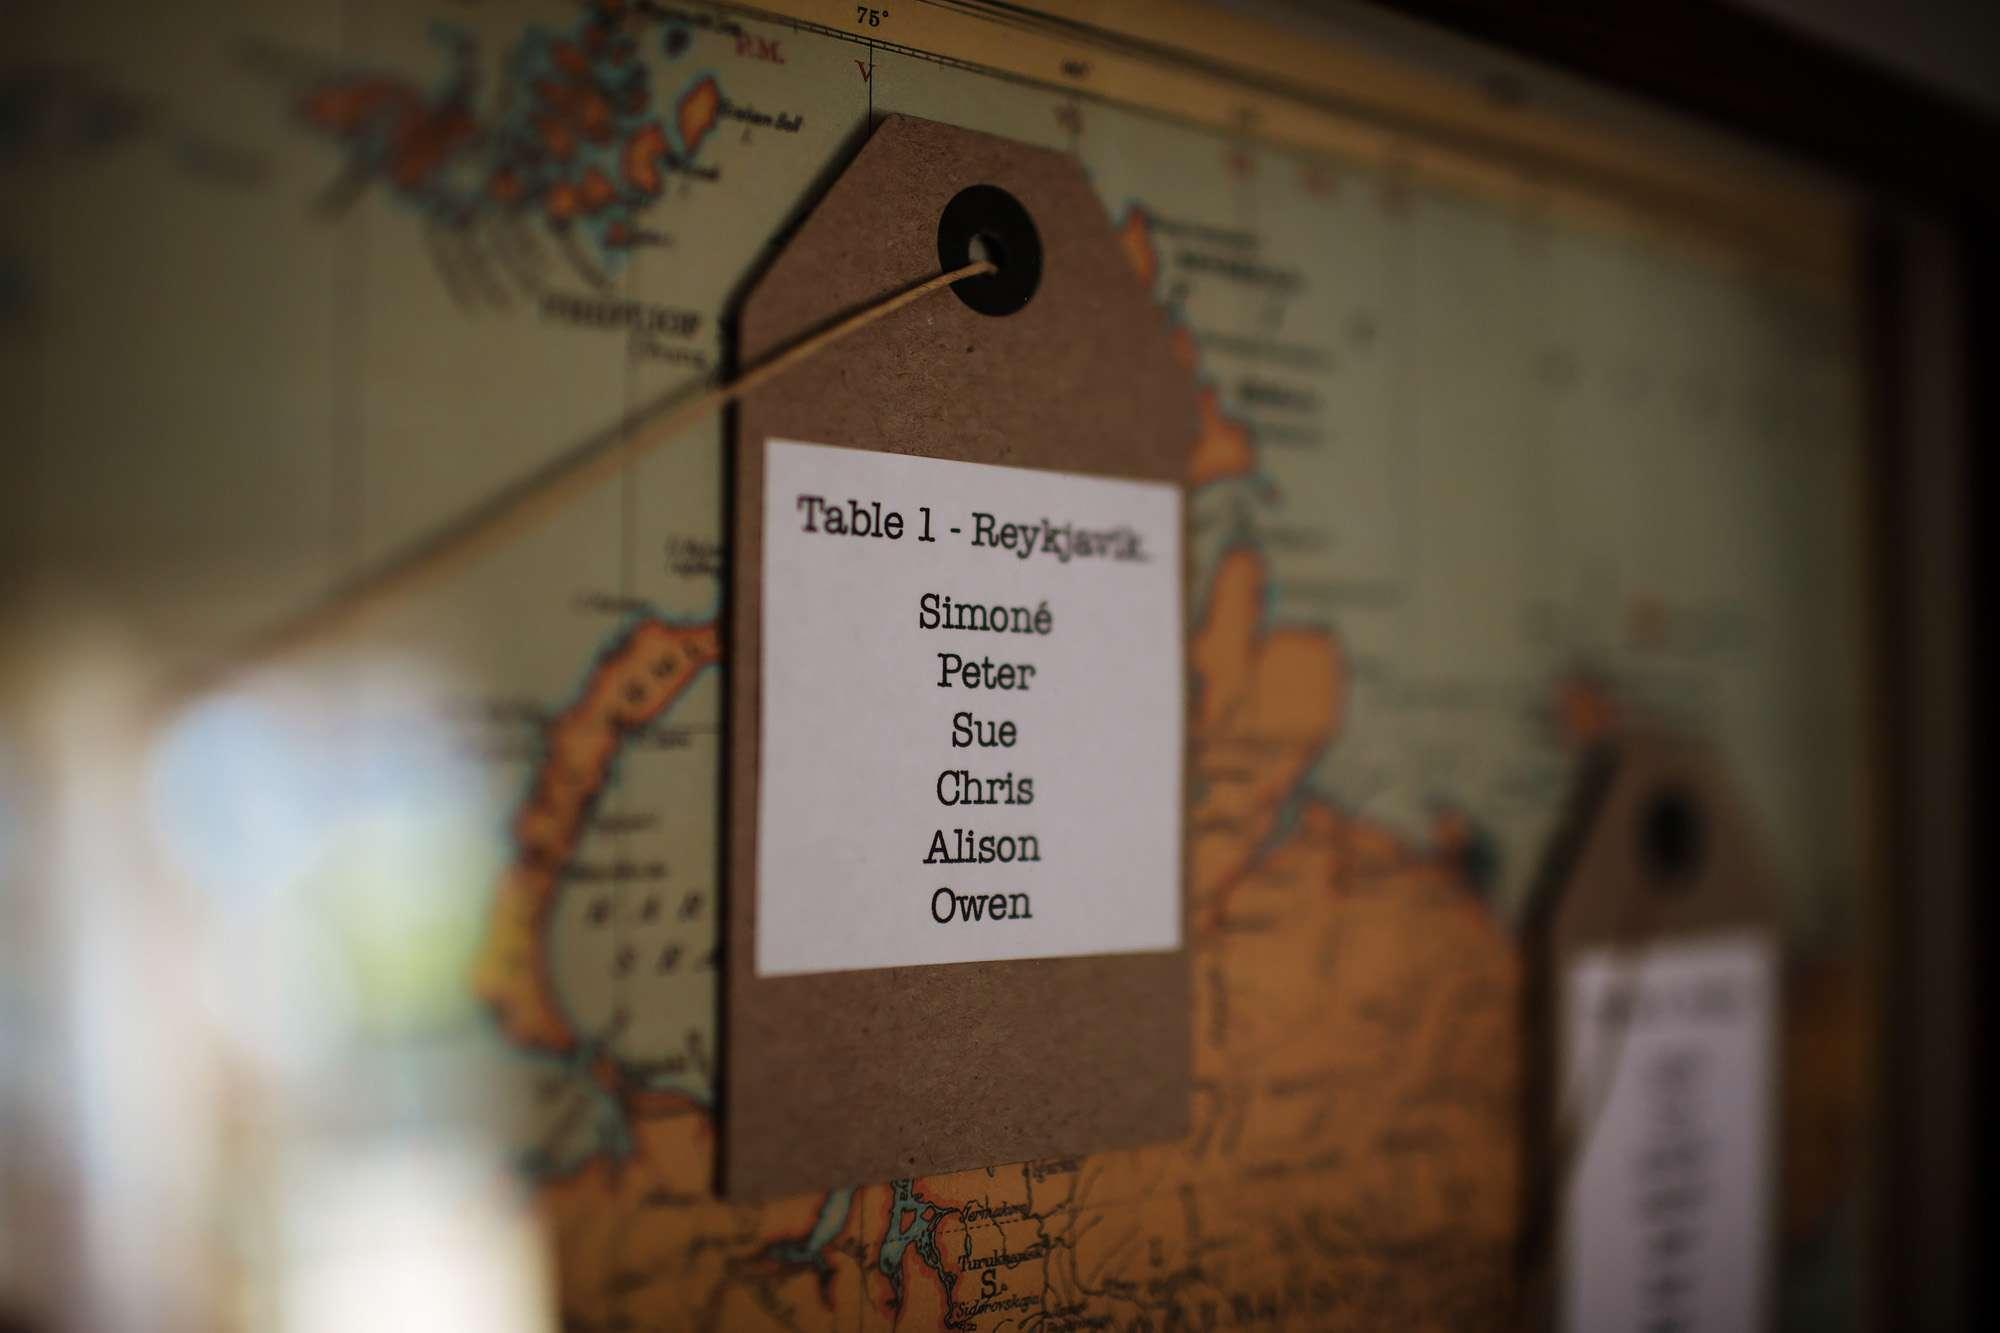 Table seating plan map at a Leeds wedding